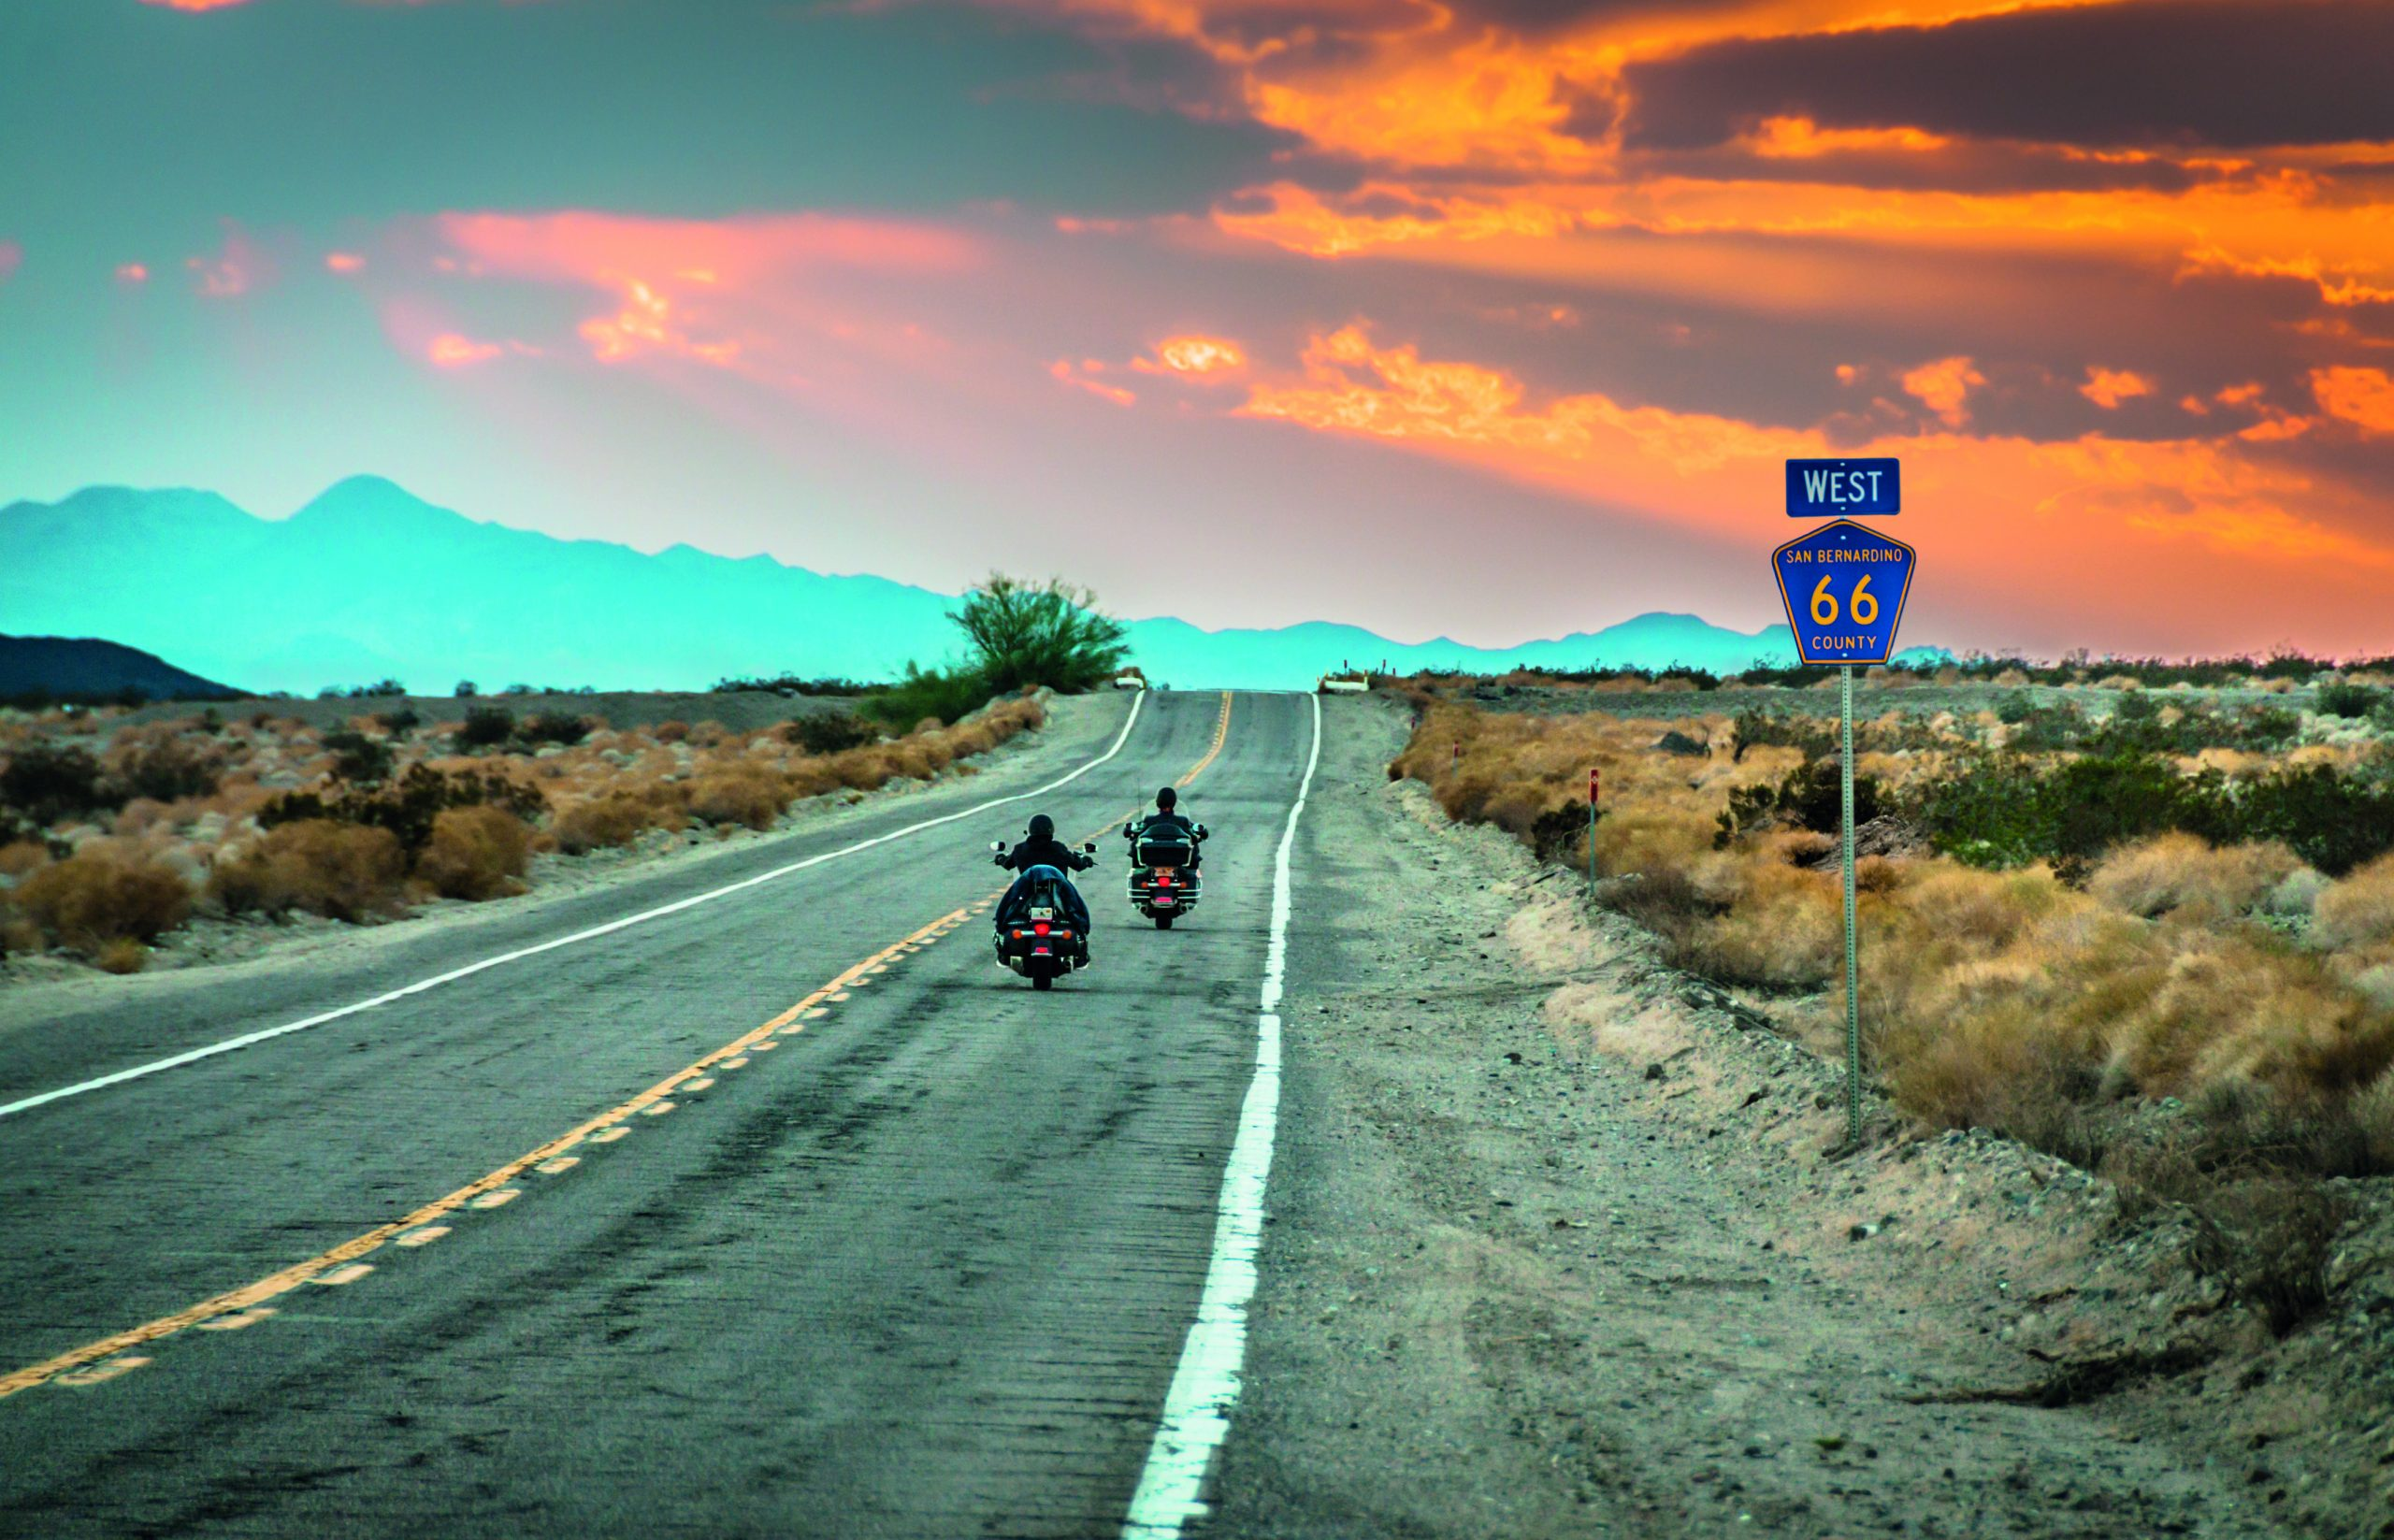 A close up of a desert road